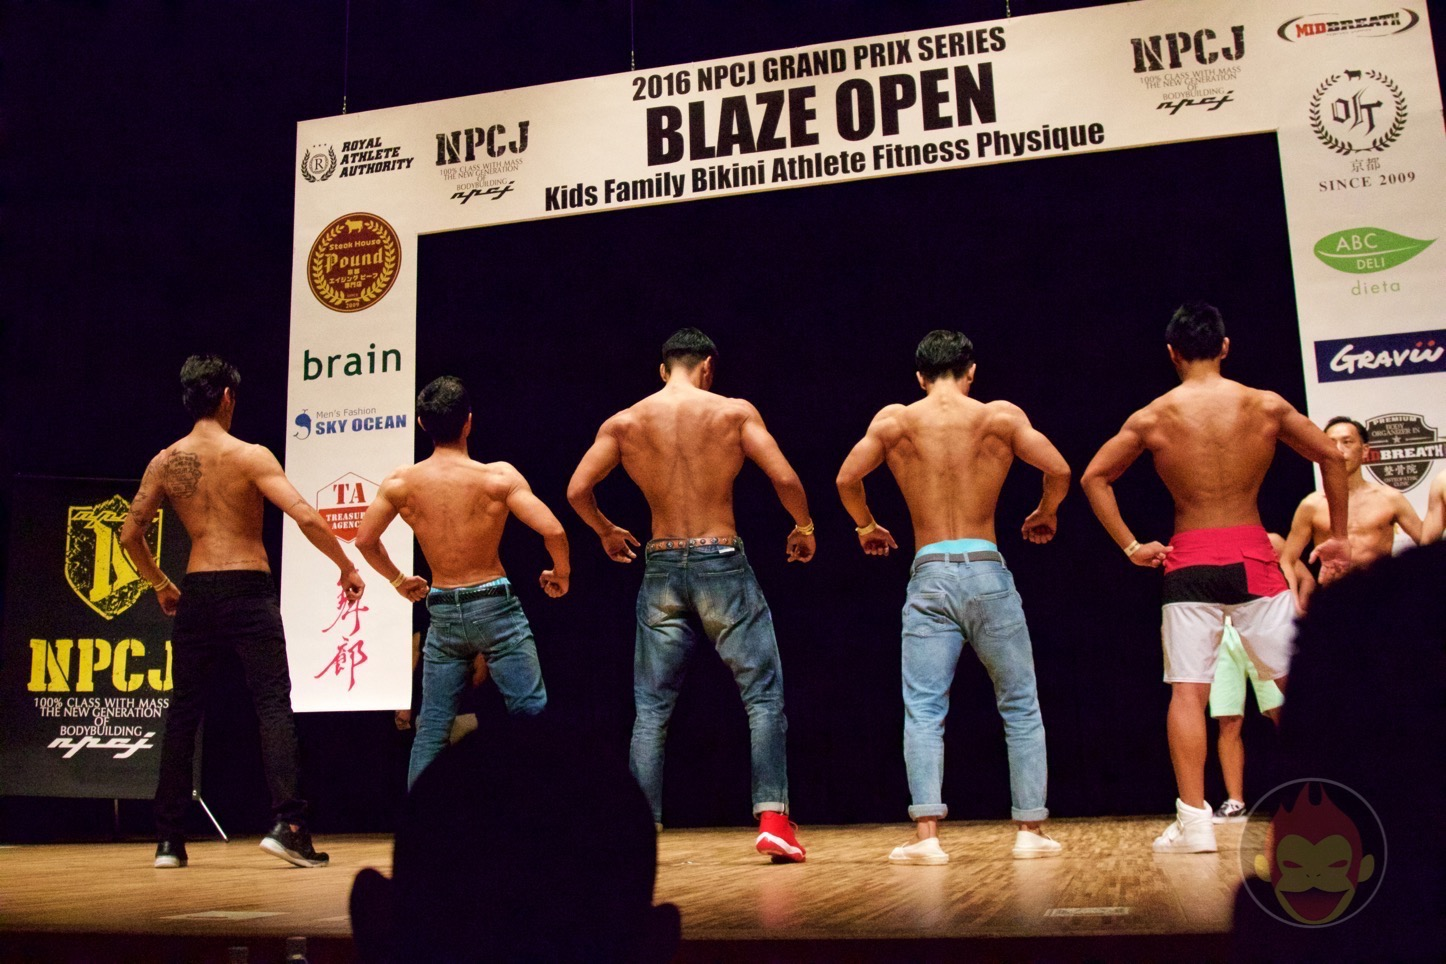 NPCJ Blaze Open 金子賢出場